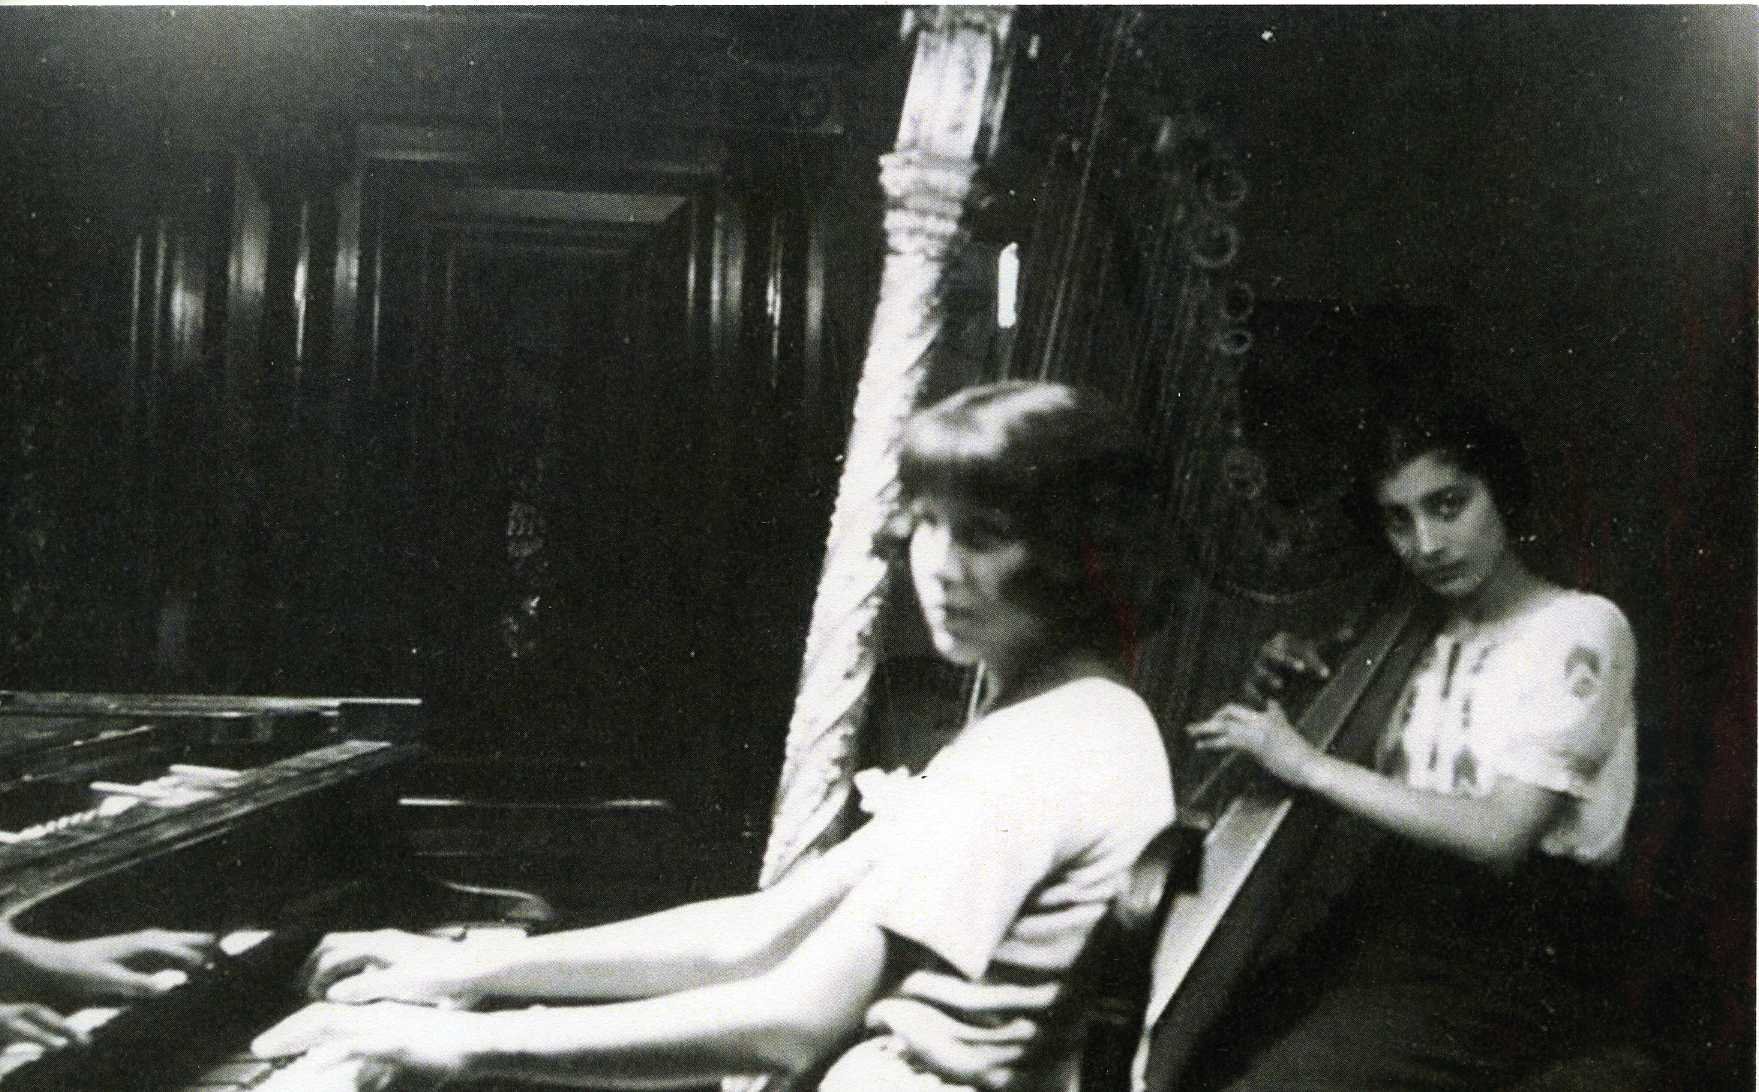 Khairunissa playing piano and Noor playing harp.